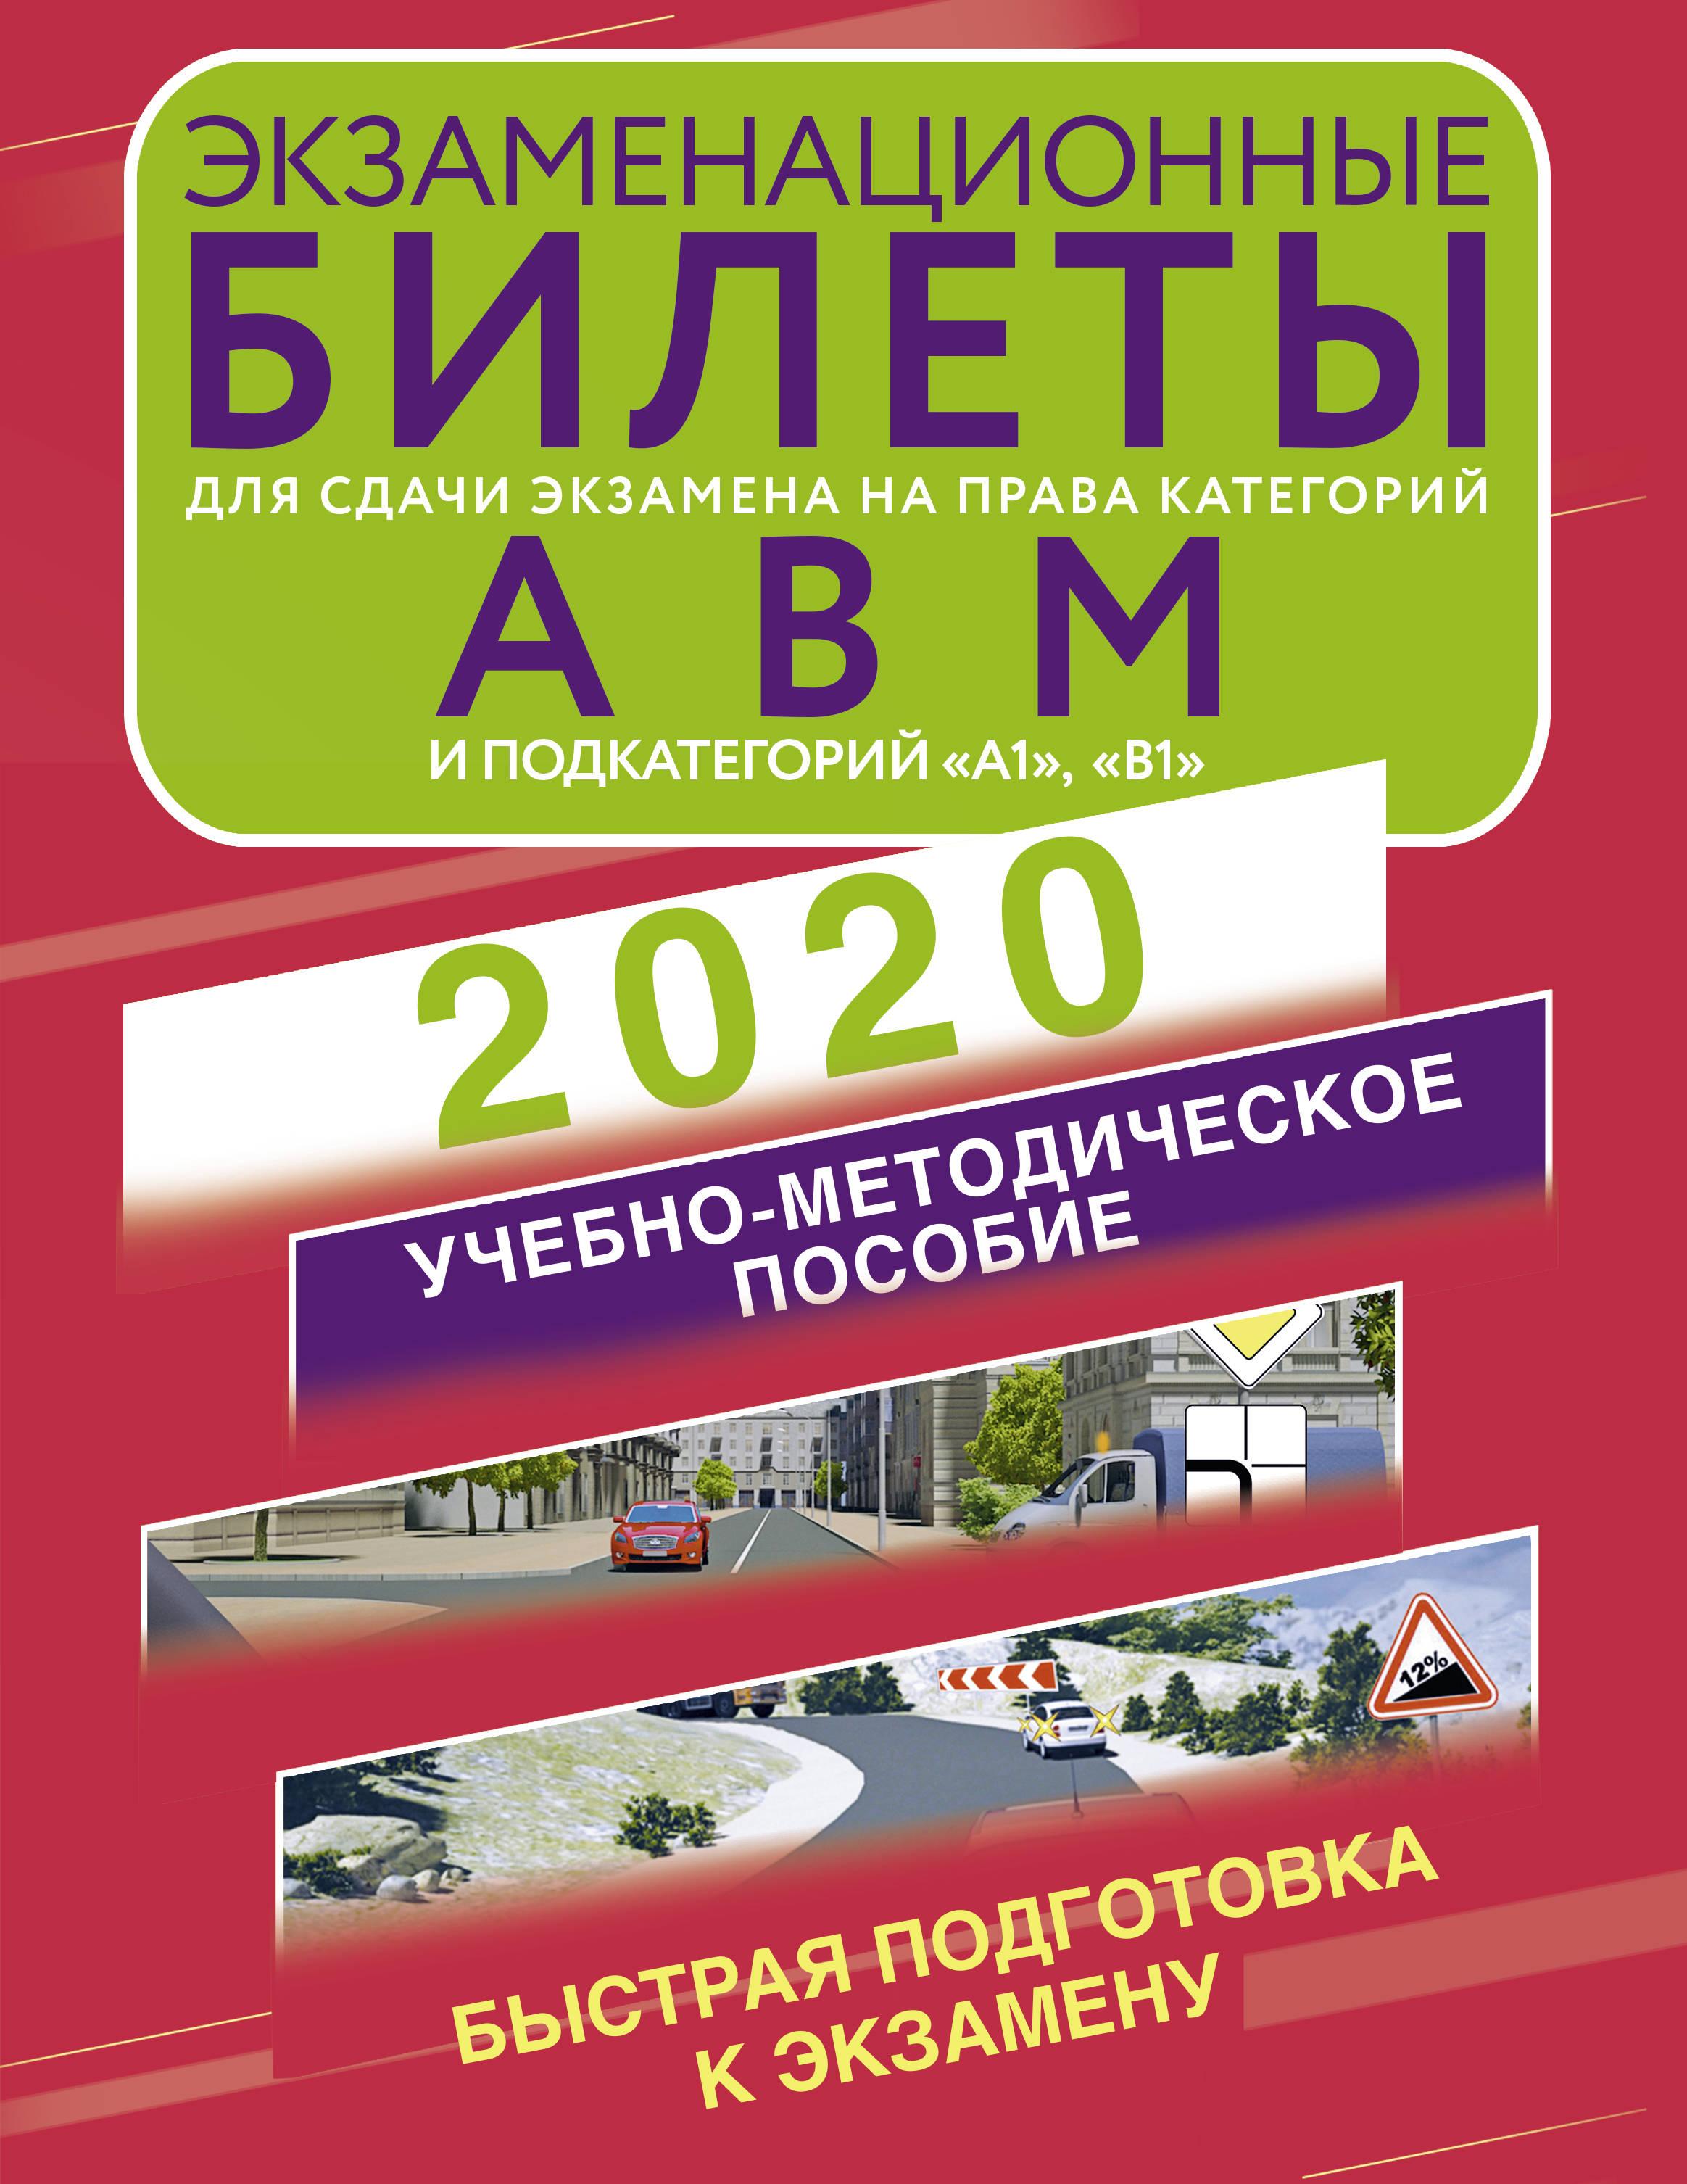 Ekzamenatsionnye bilety dlja sdachi ekzamena na prava kategorij A, V i M, podkategorij A1 i V1 na 2020 god